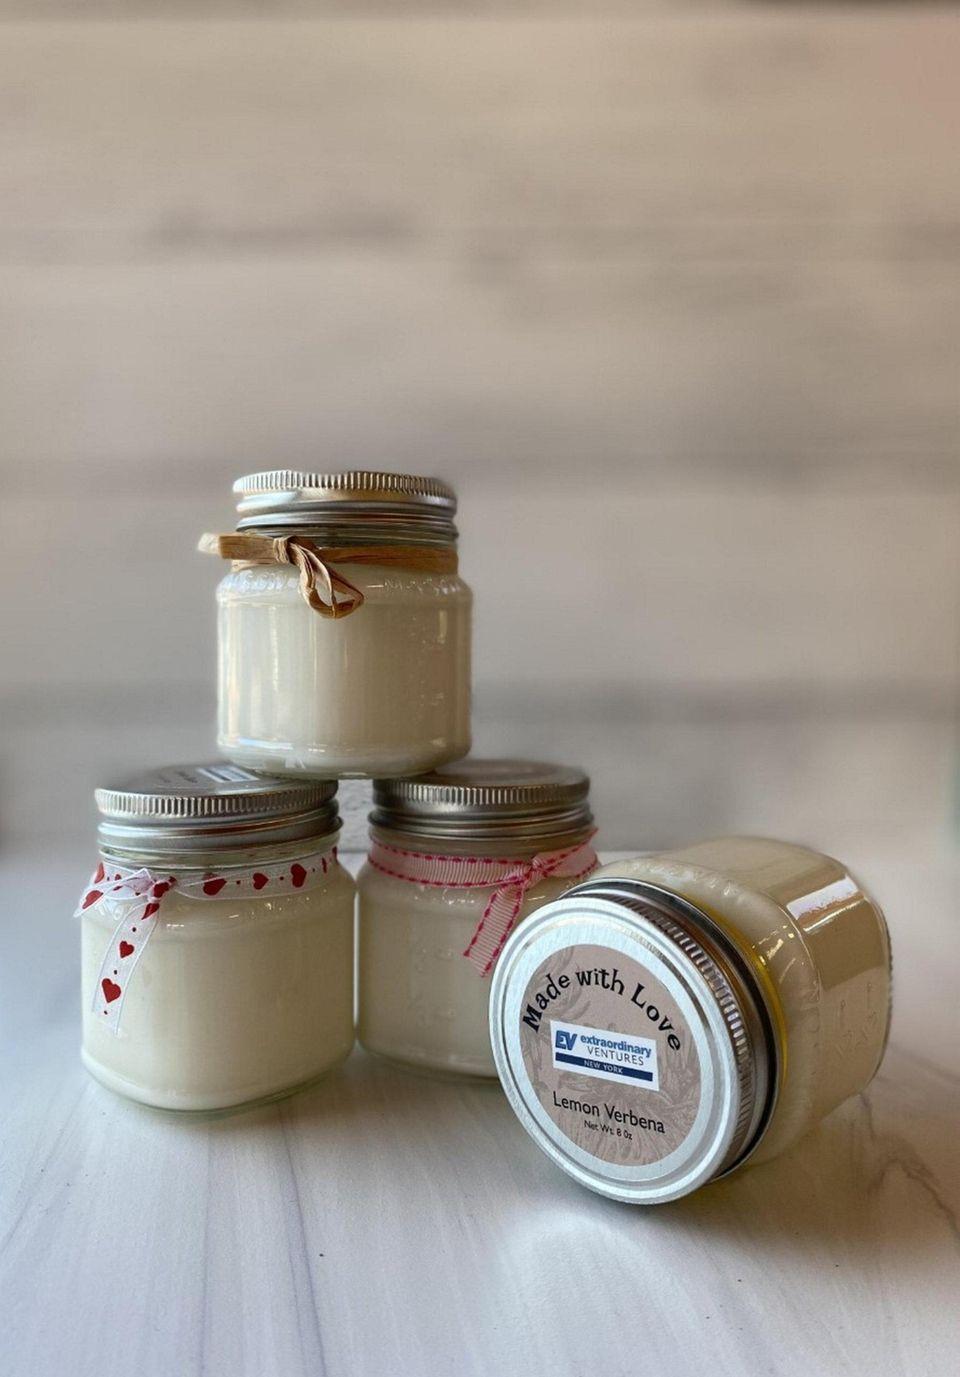 Handmade soy candles scented in lemon verbena, lavender